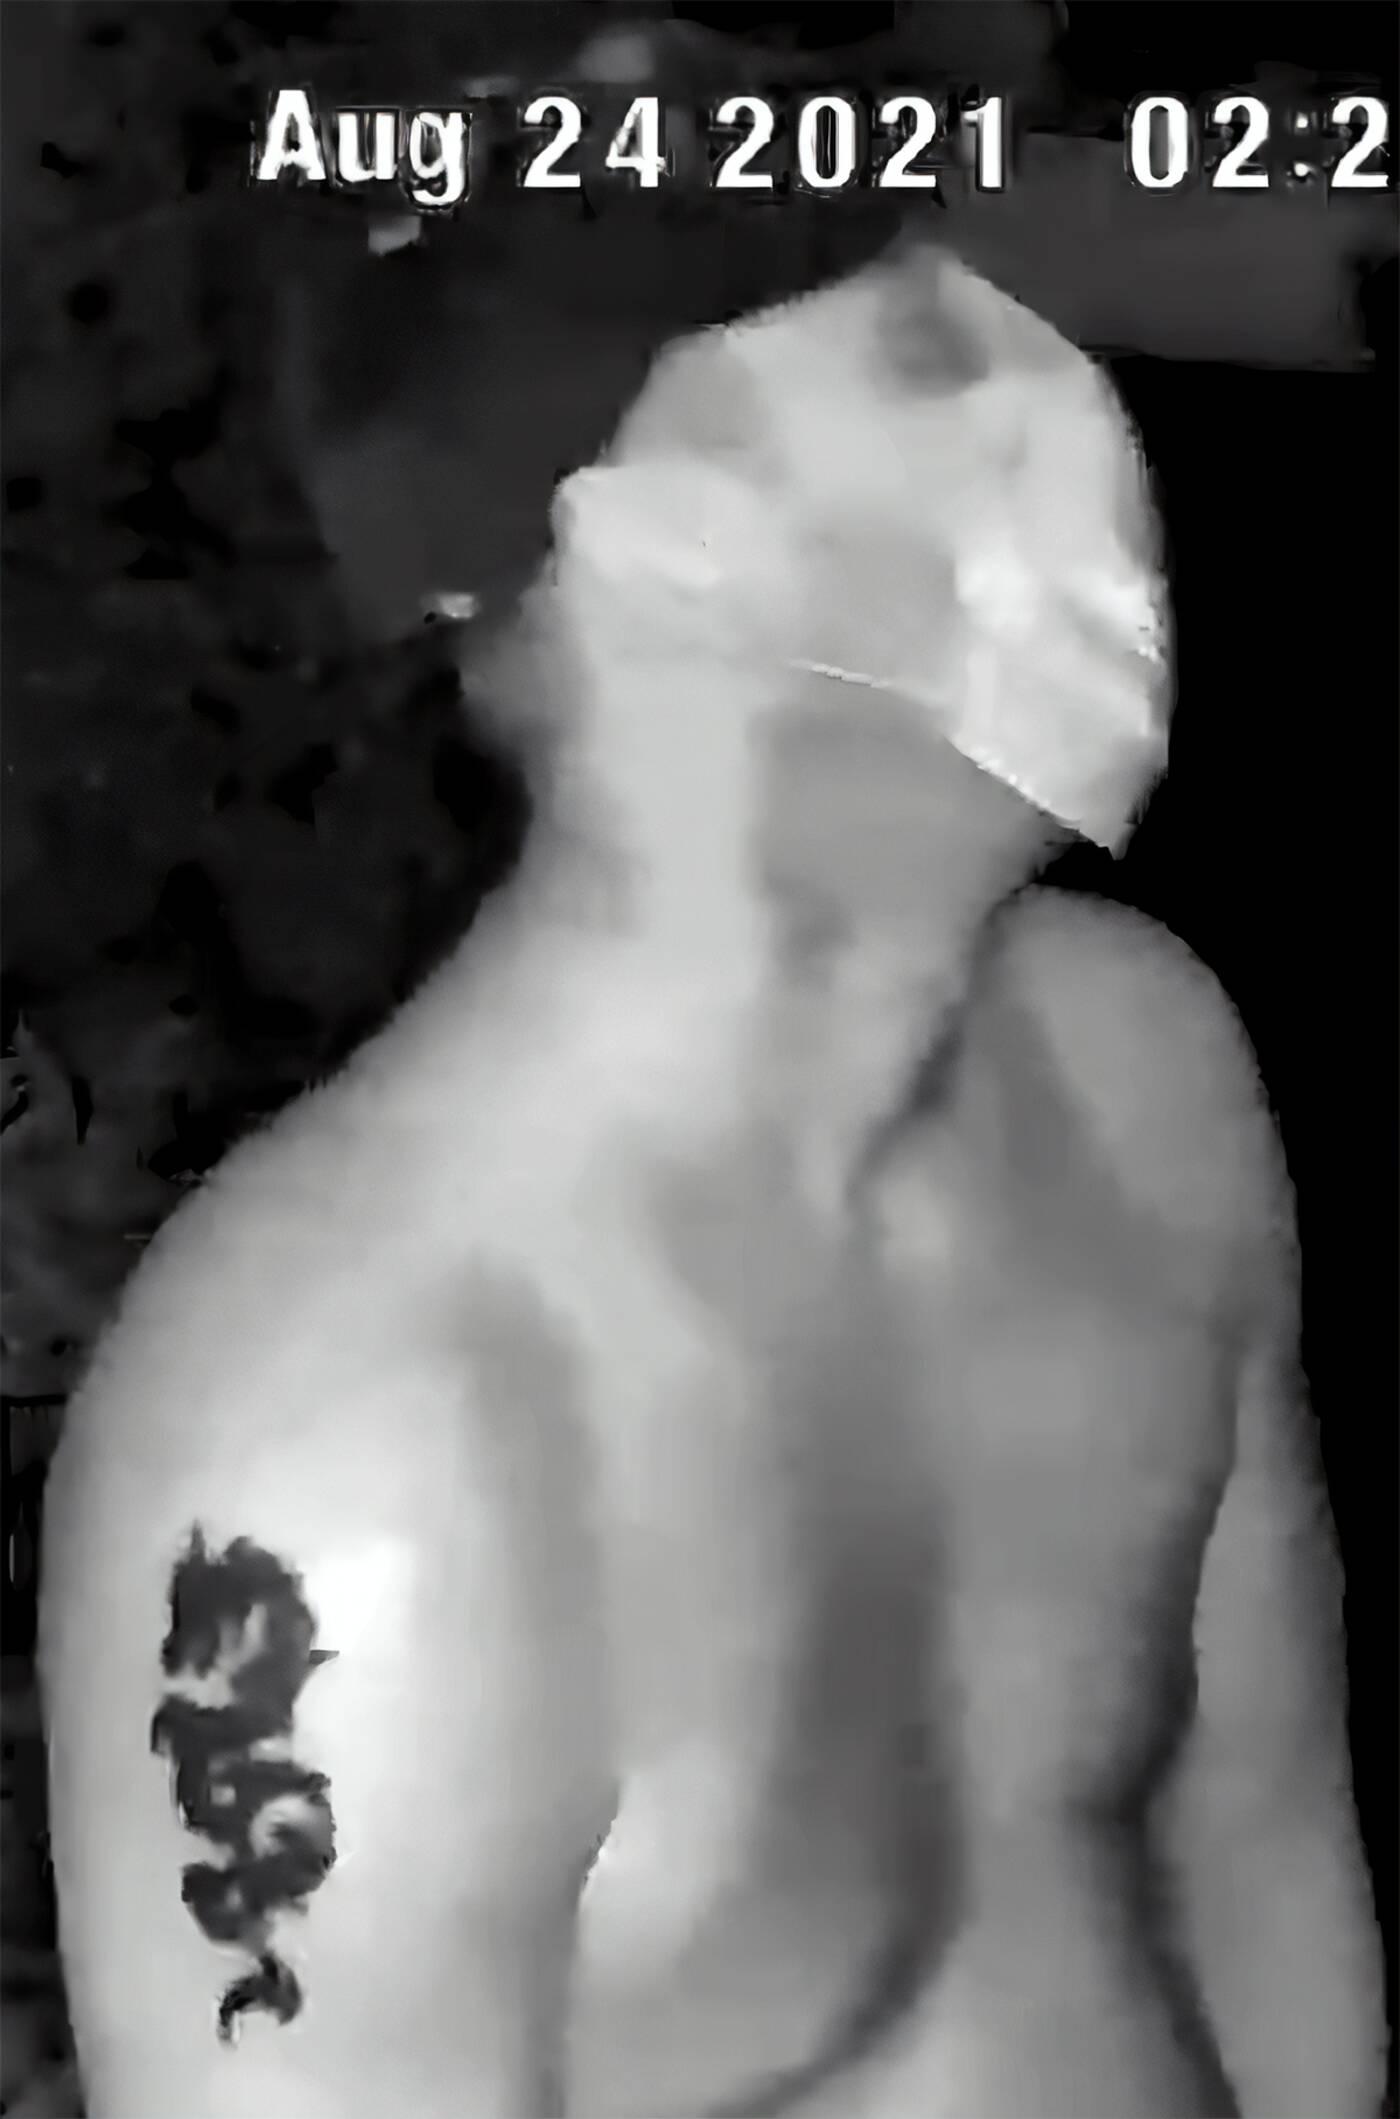 richmond hill prowler